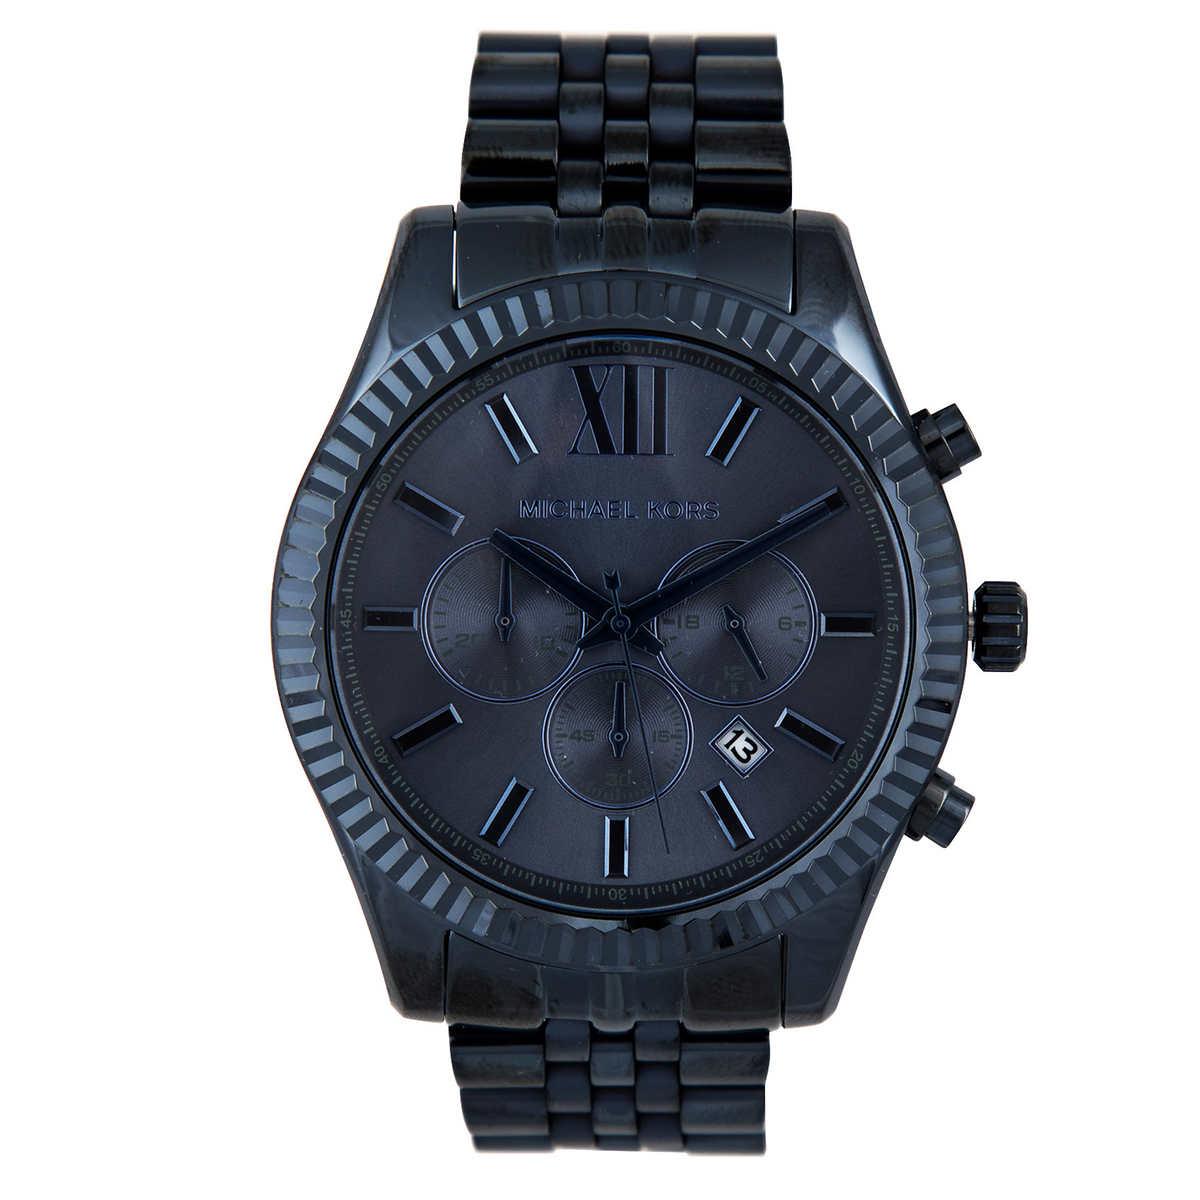 69fcd8bfb7b4 Michael Kors Lexington Blue Dial Men s Watch. 1 1